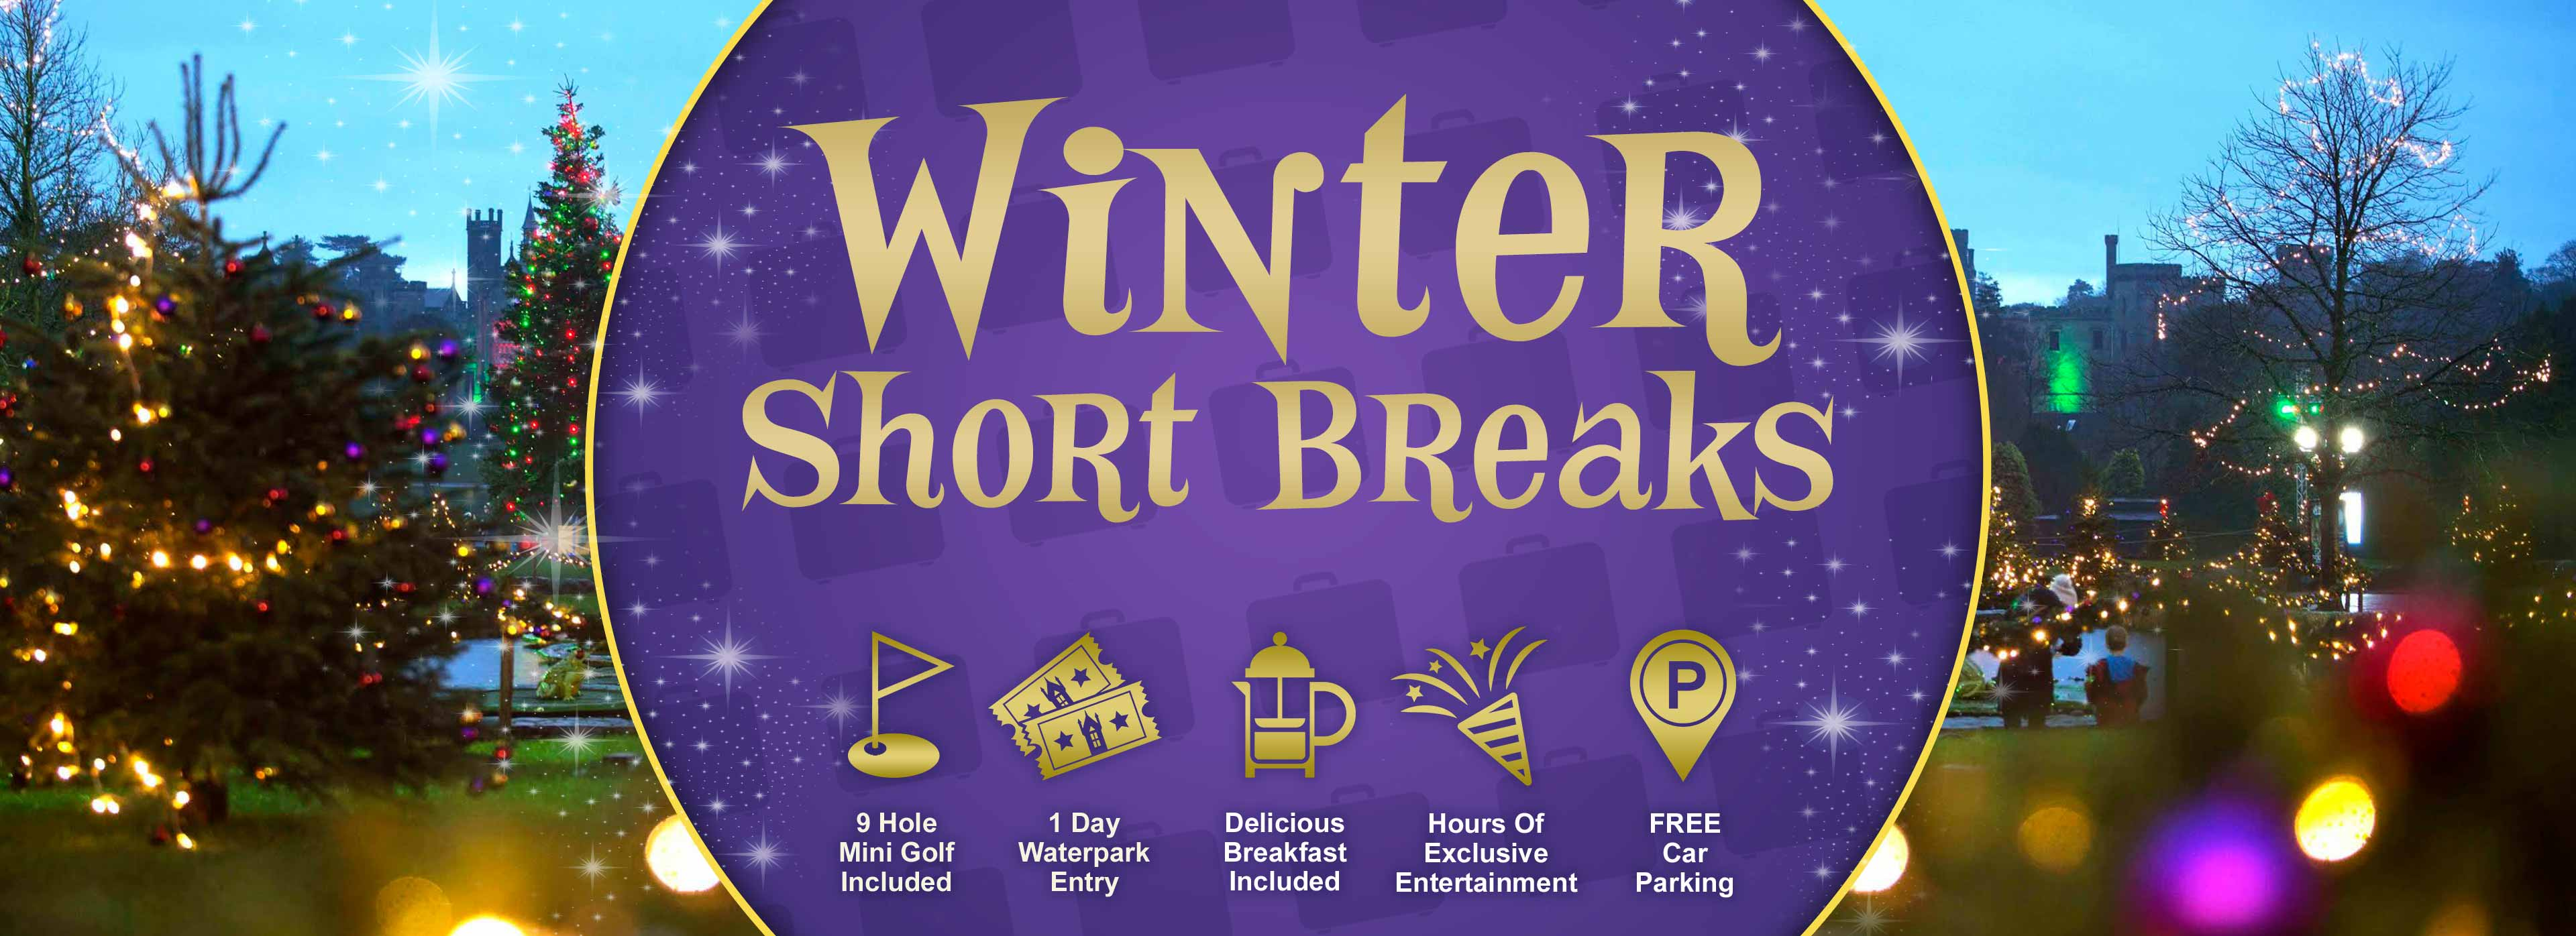 Winter Short Breaks at Alton Towers Resort